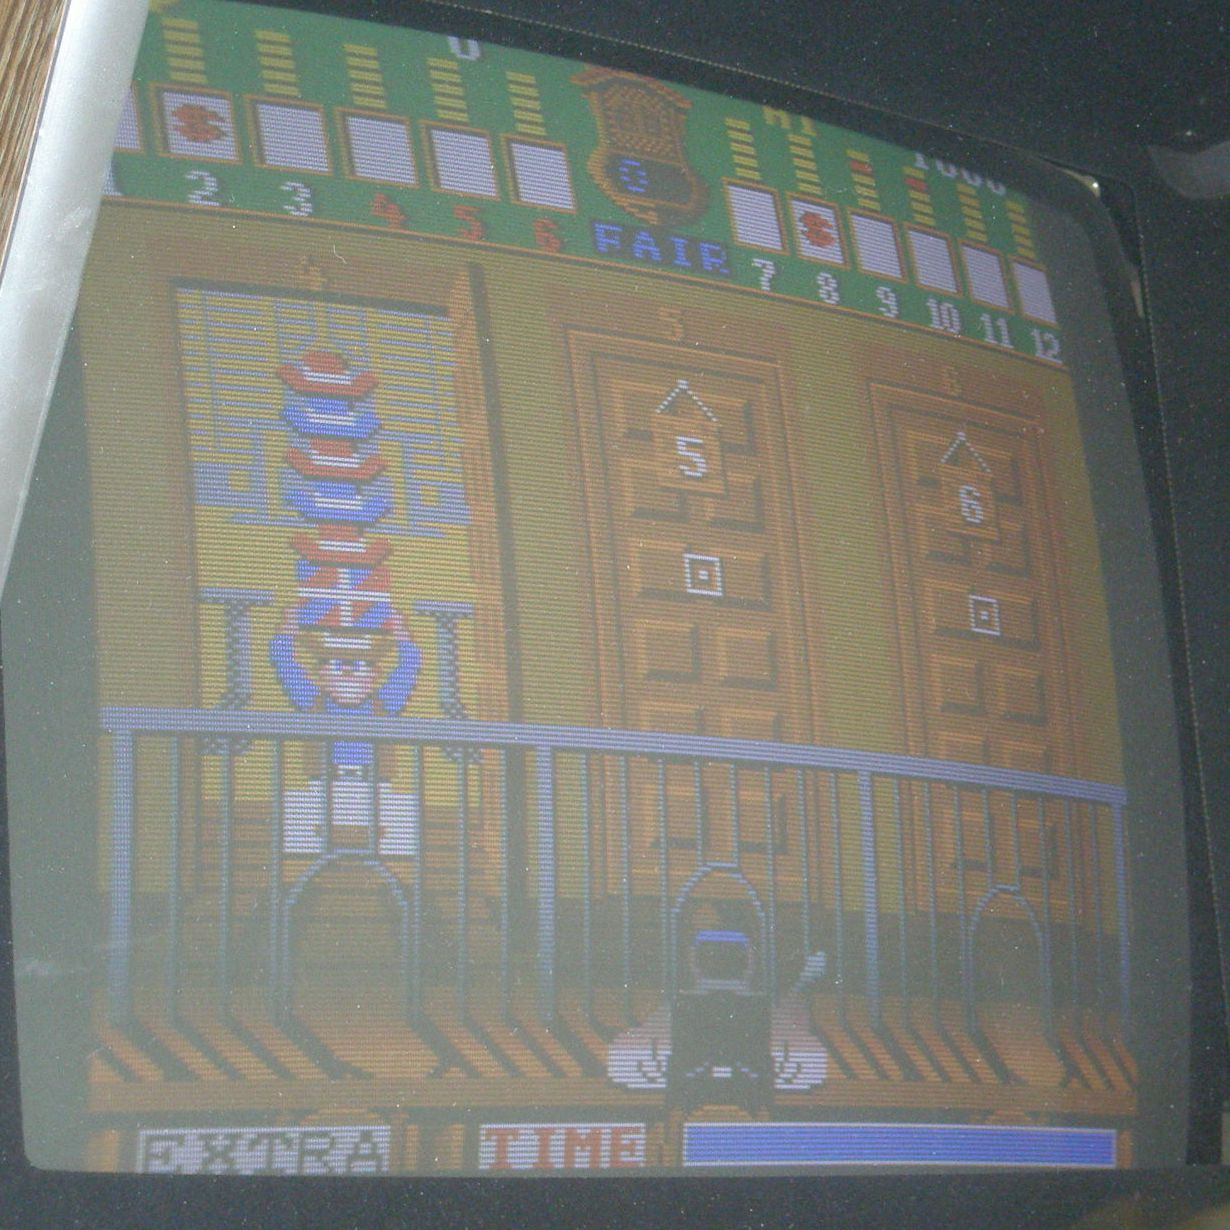 http://arcadius.esero.net/Arcade/Games/Non_Jamma_Fully_Working/Bank_Panic_06.jpg